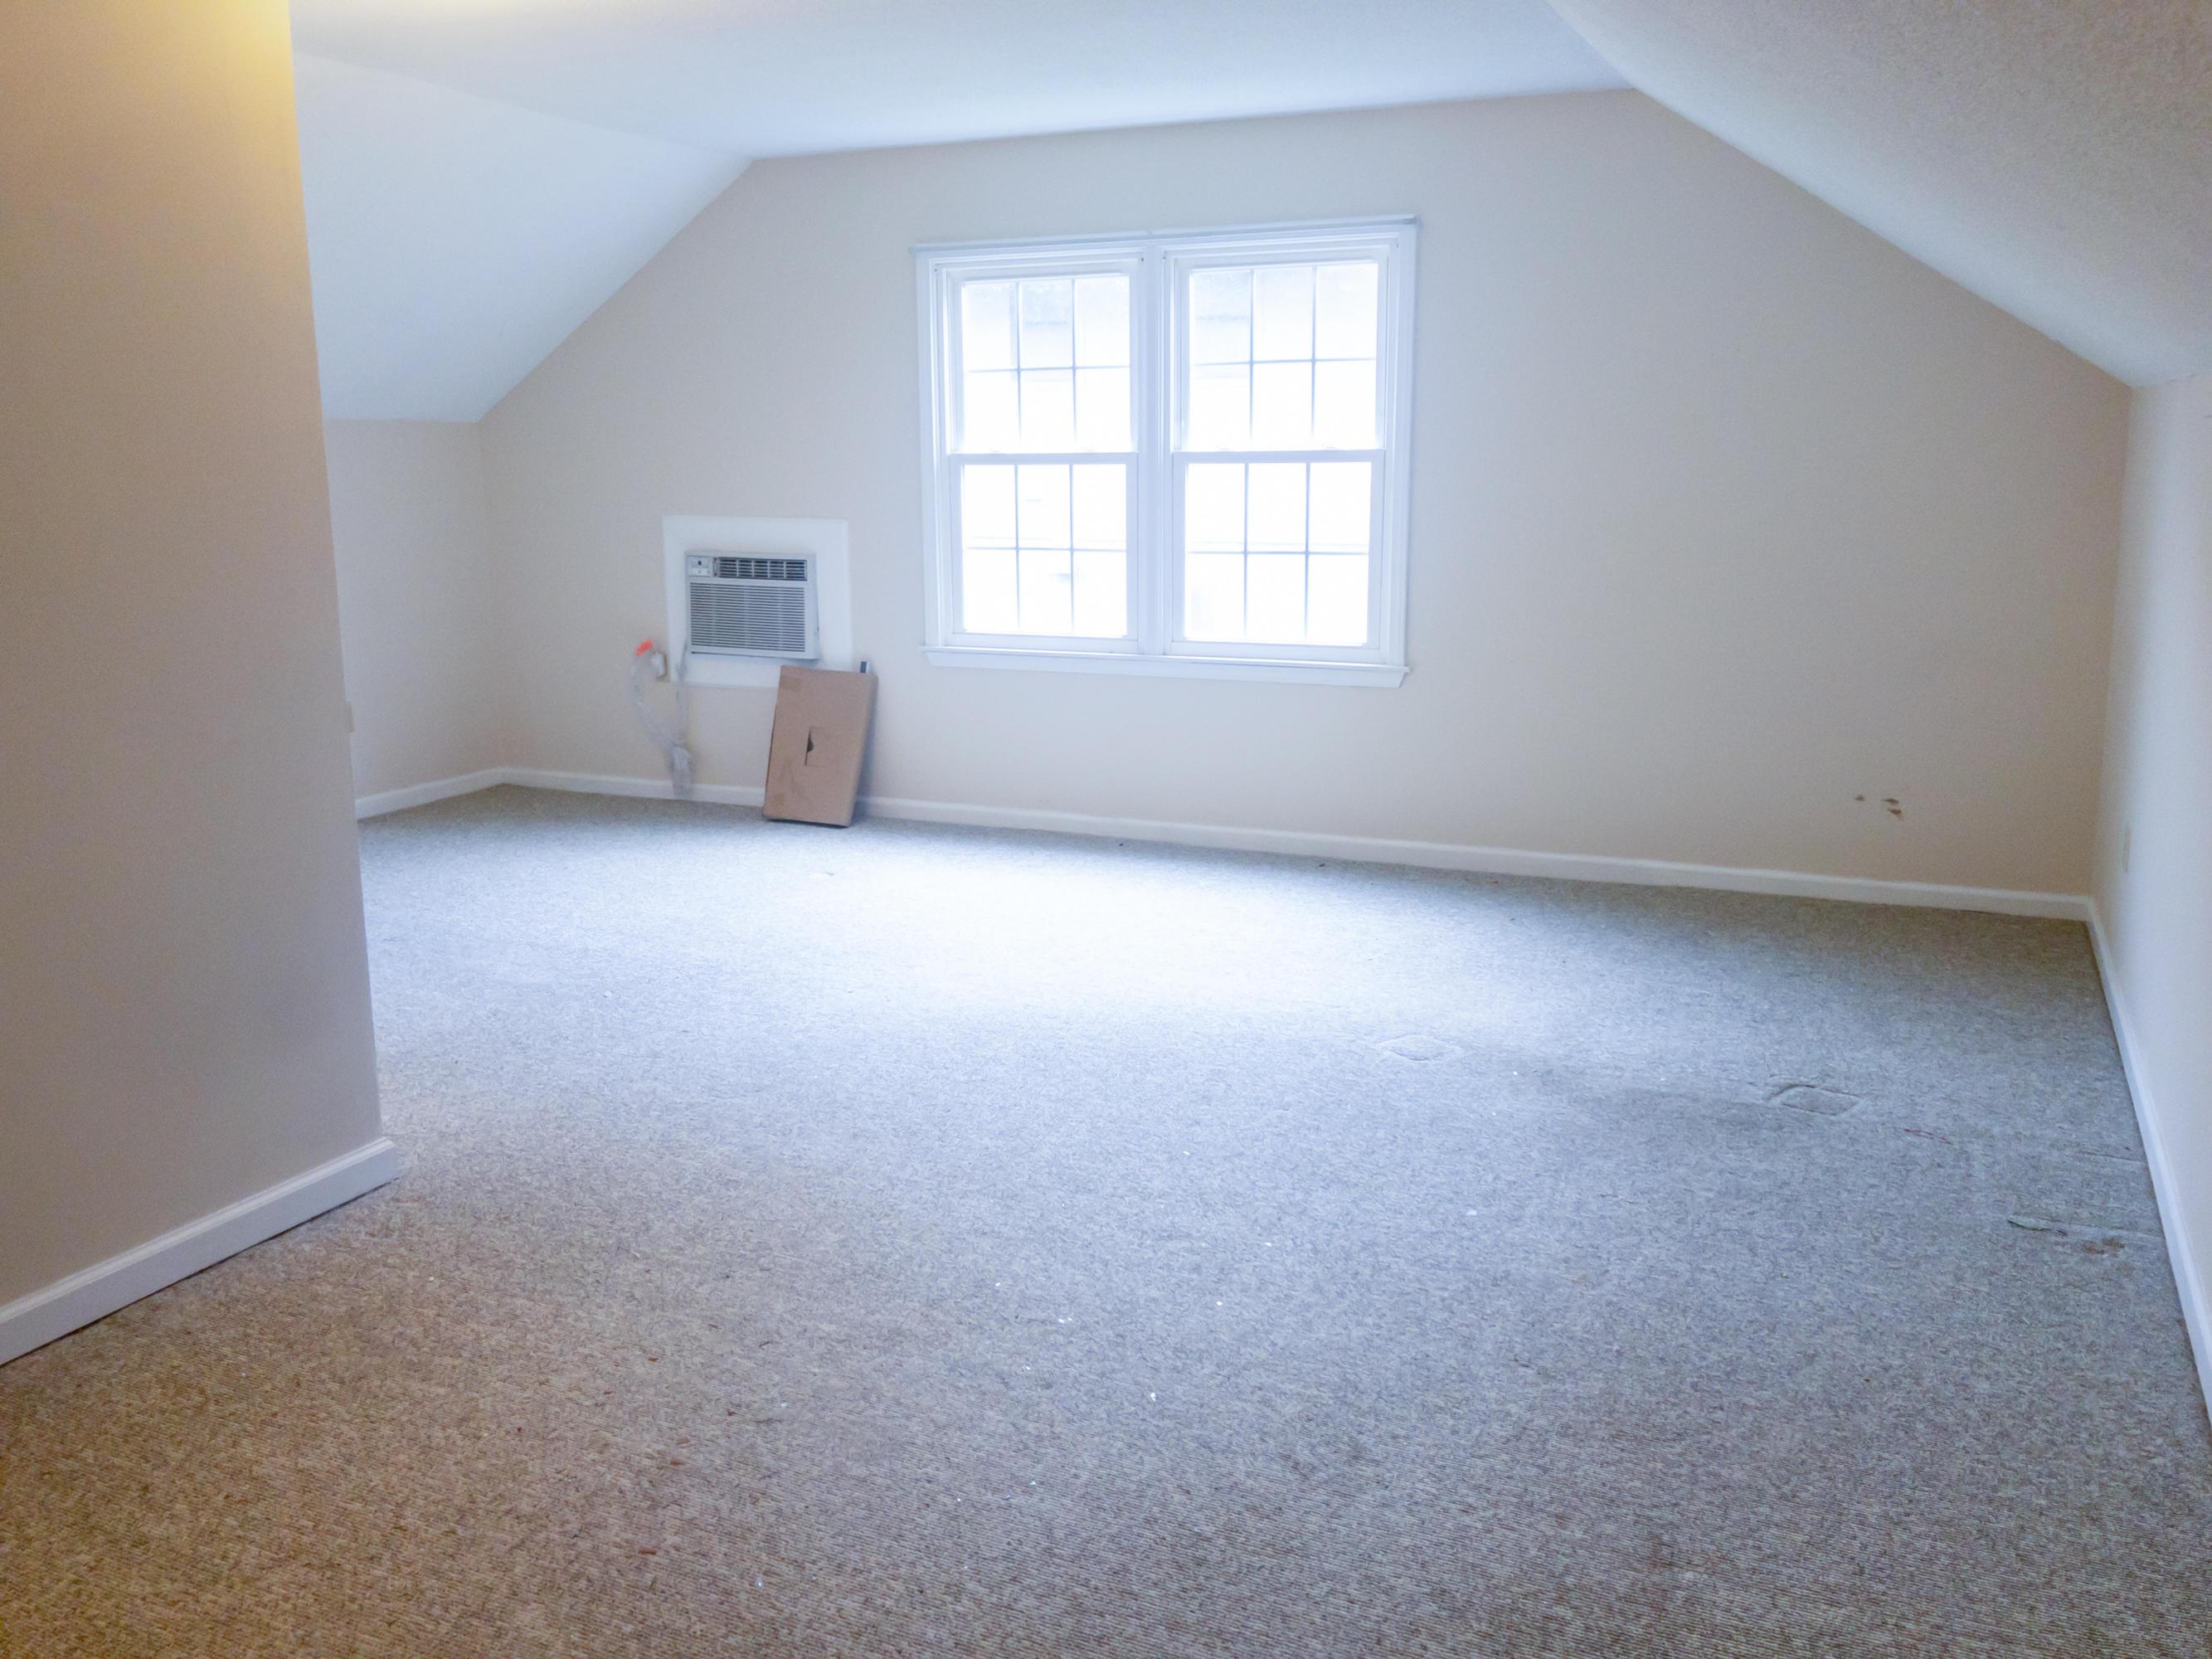 Wakendaw Lakes Homes For Sale - 1251 Vagabond, Mount Pleasant, SC - 40